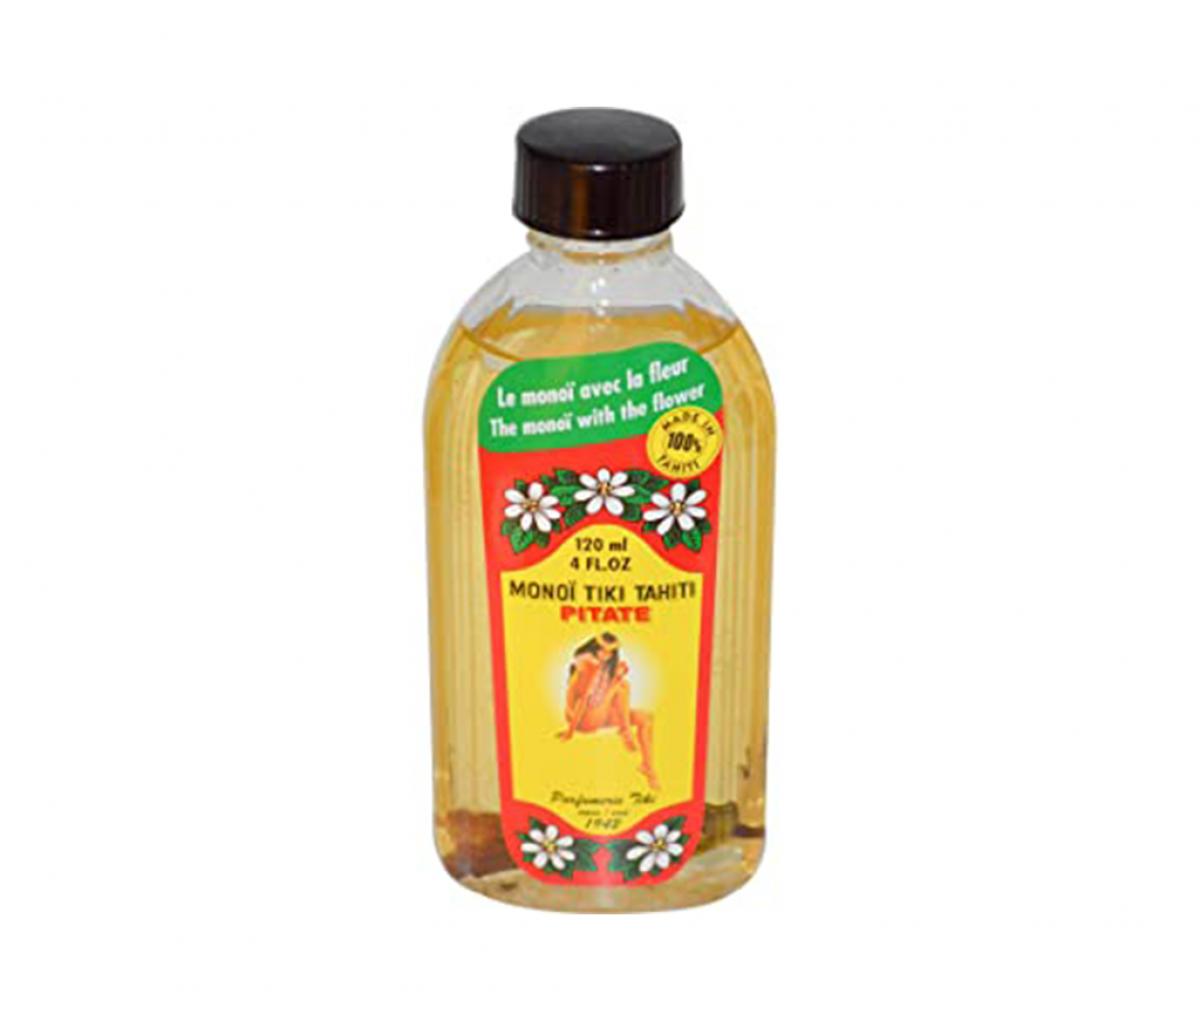 Jasmine Monol Oil